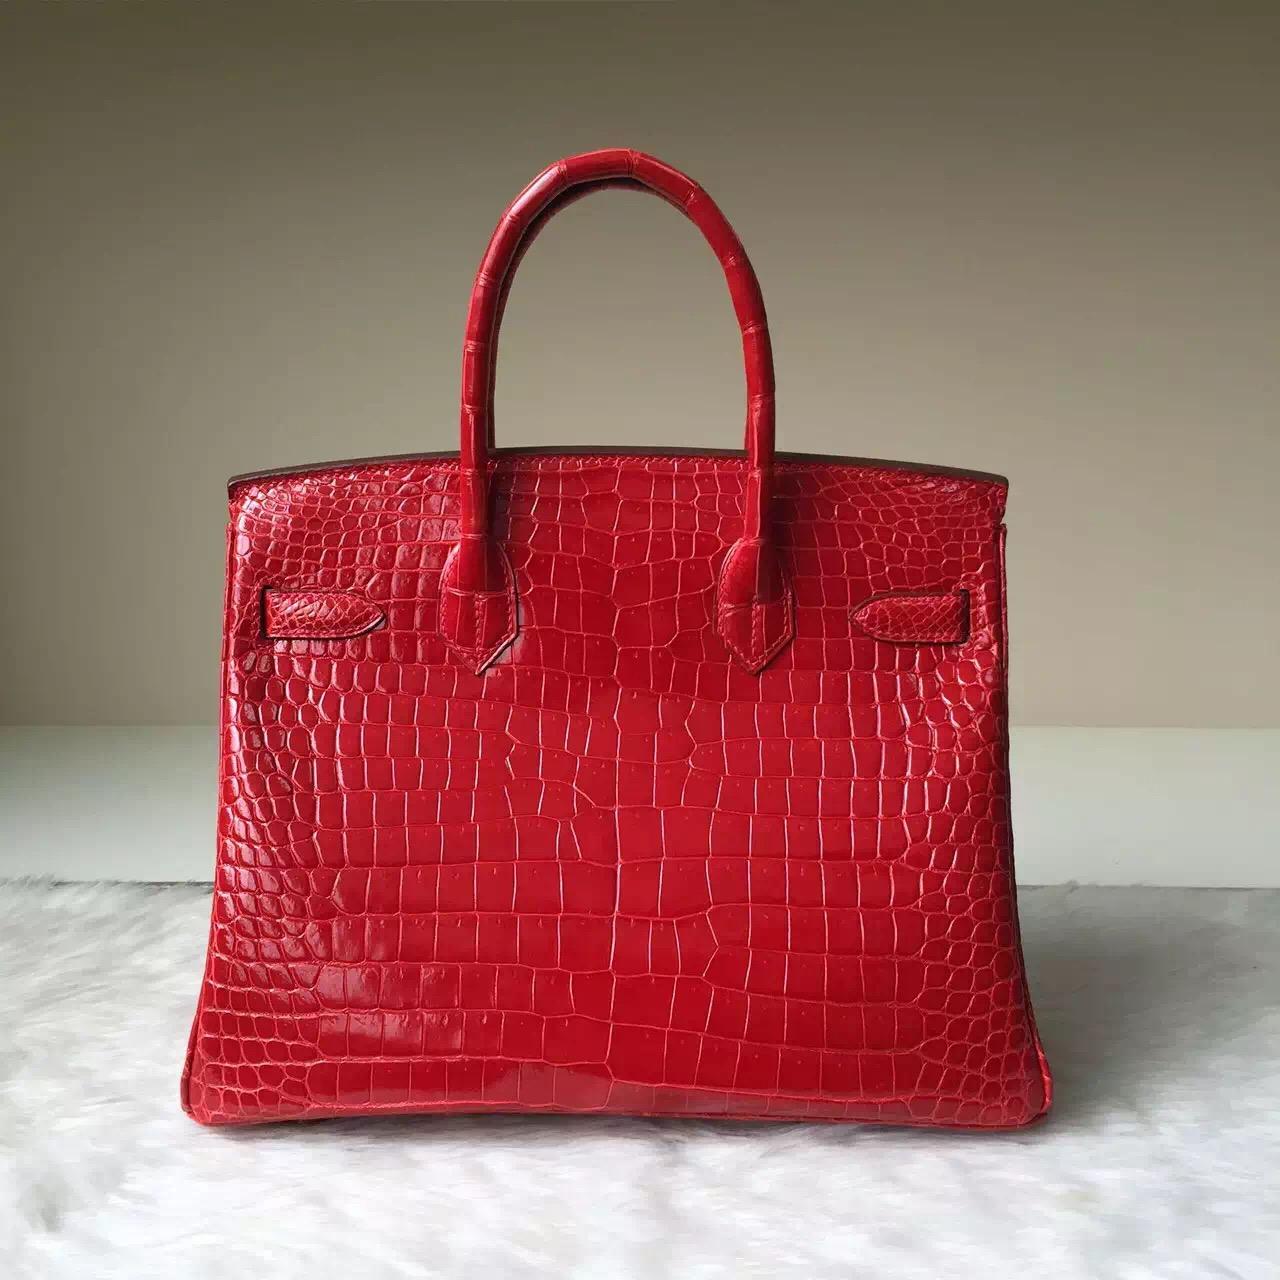 Discount Hermes Bag CK95 Ferrari Red Crocodile Shiny Leather Birkin 30cm